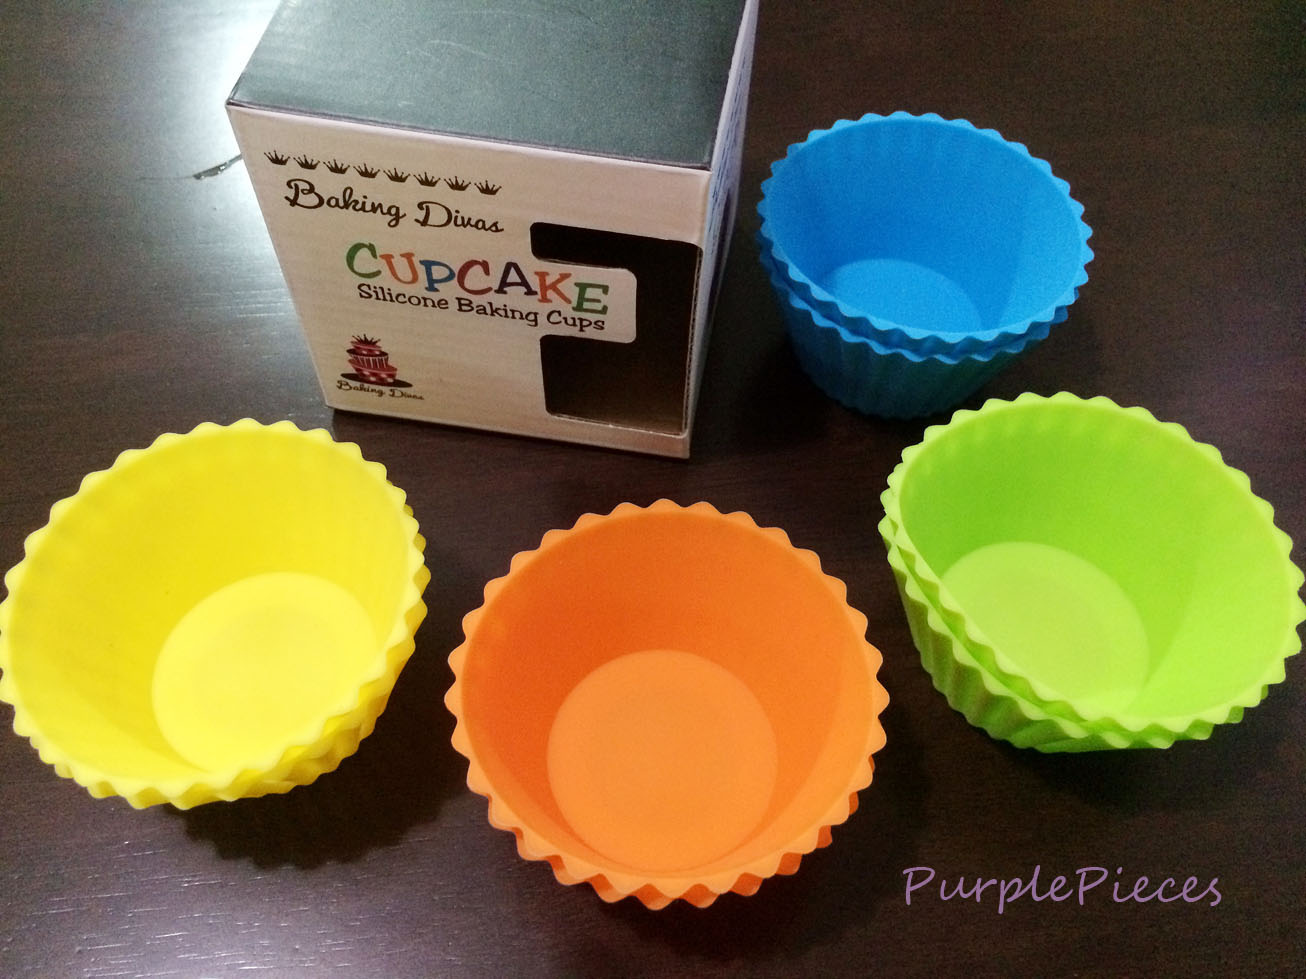 baking-divas-silicone-baking-cups